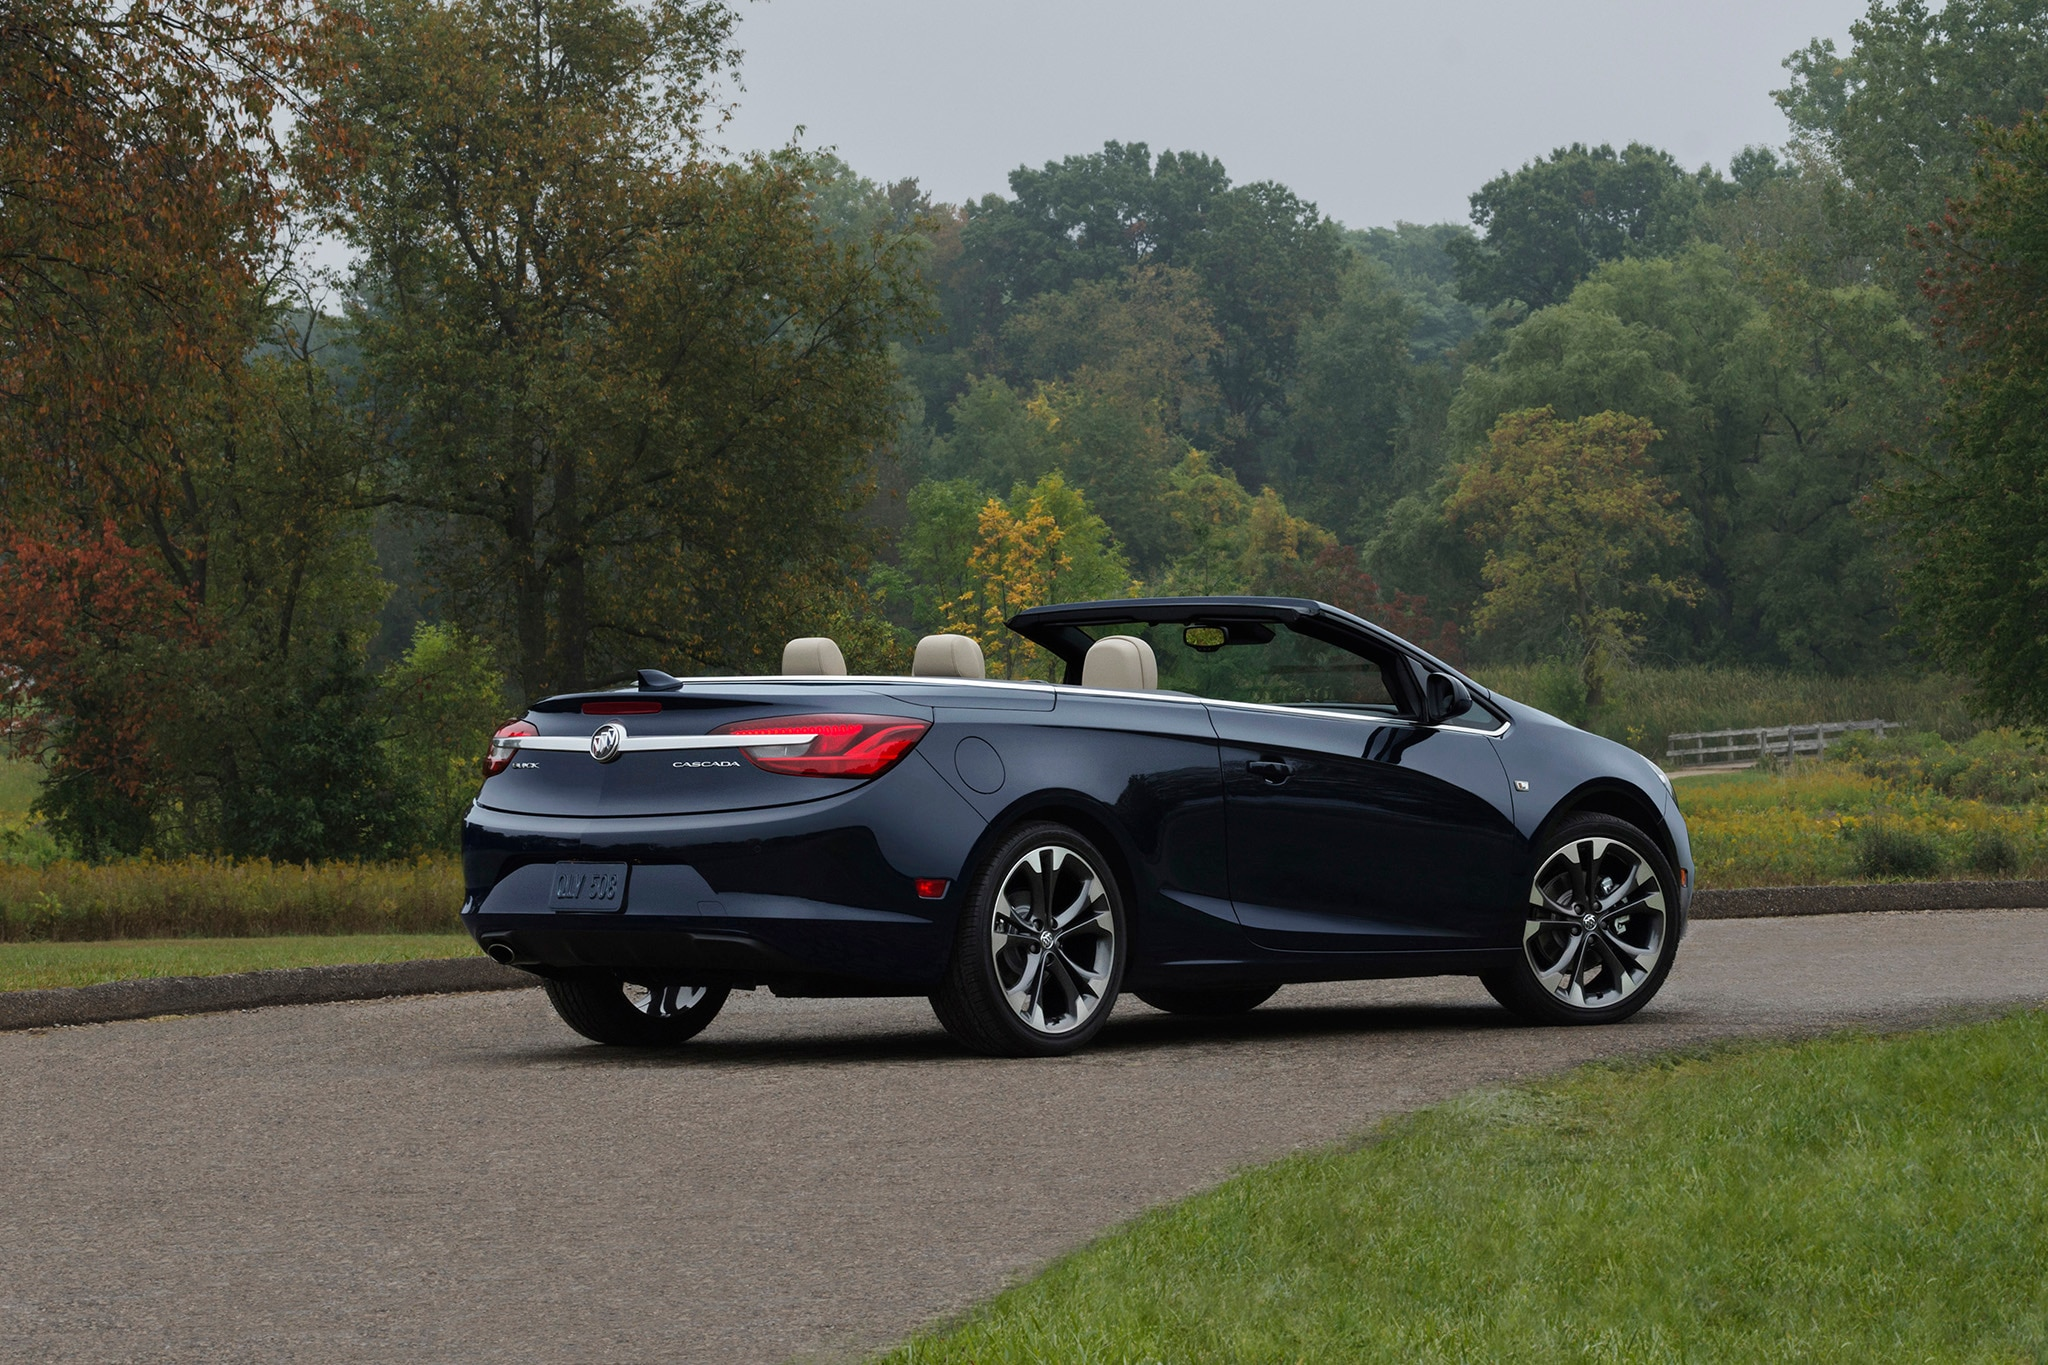 2018 Buick Cascada Rear Three Quarters Top Down